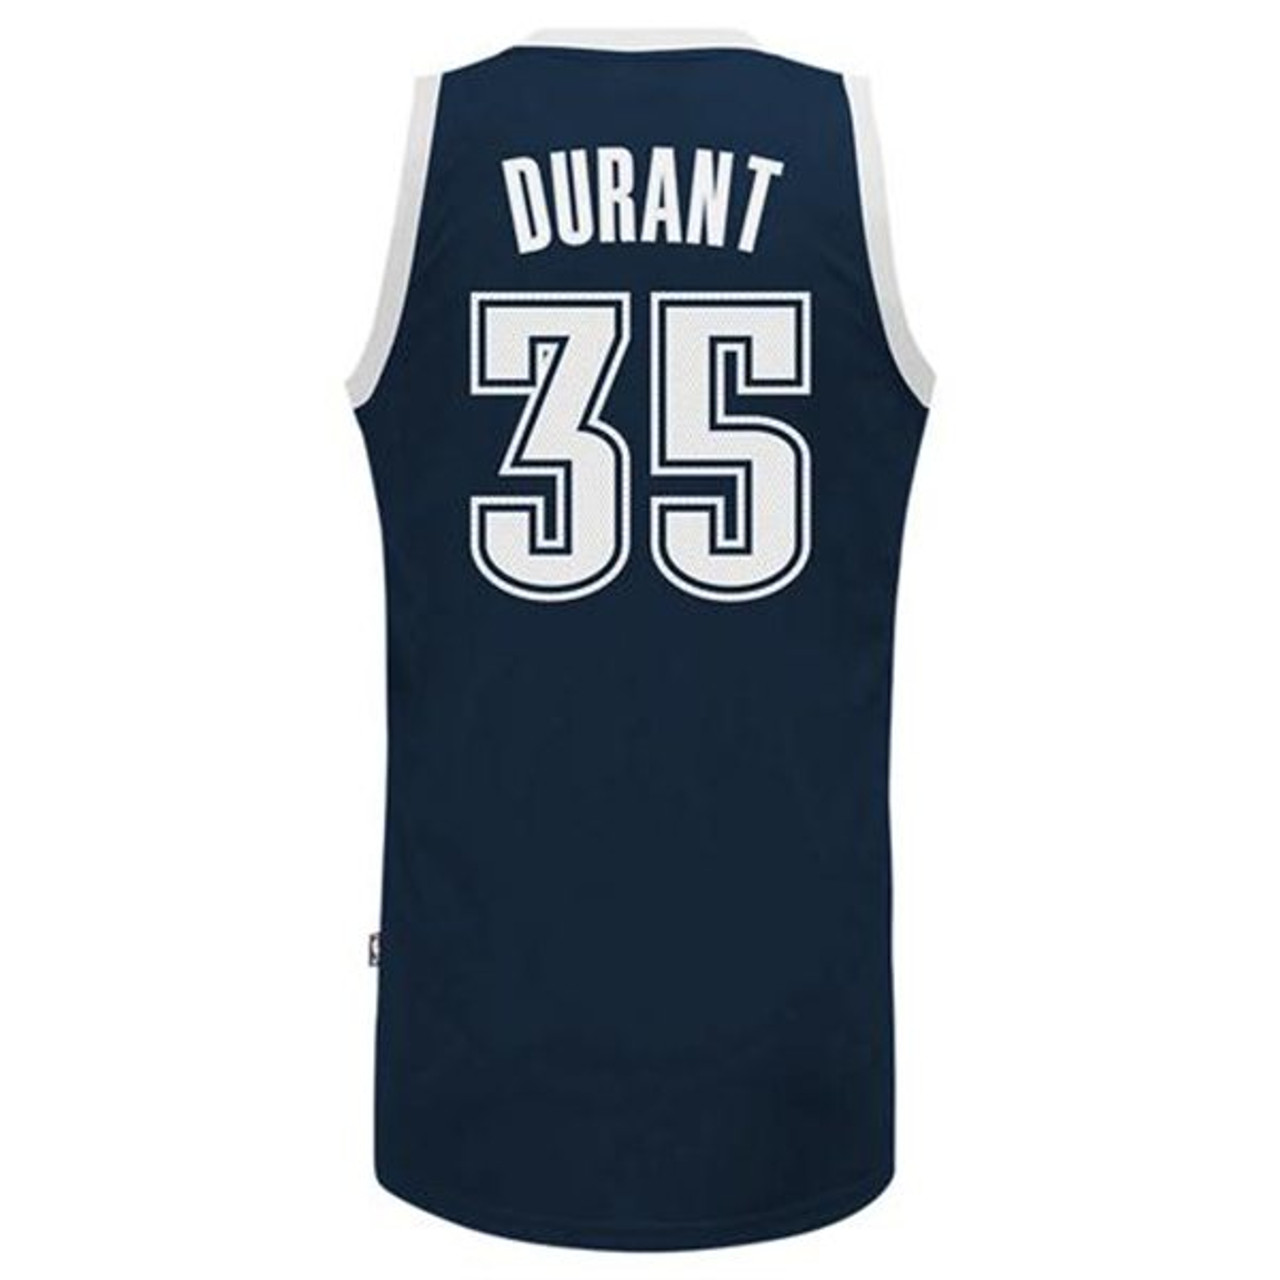 0b7f61998a4 Oklahoma City Thunder - Kevin Durant - Navy Blue Alternate ...